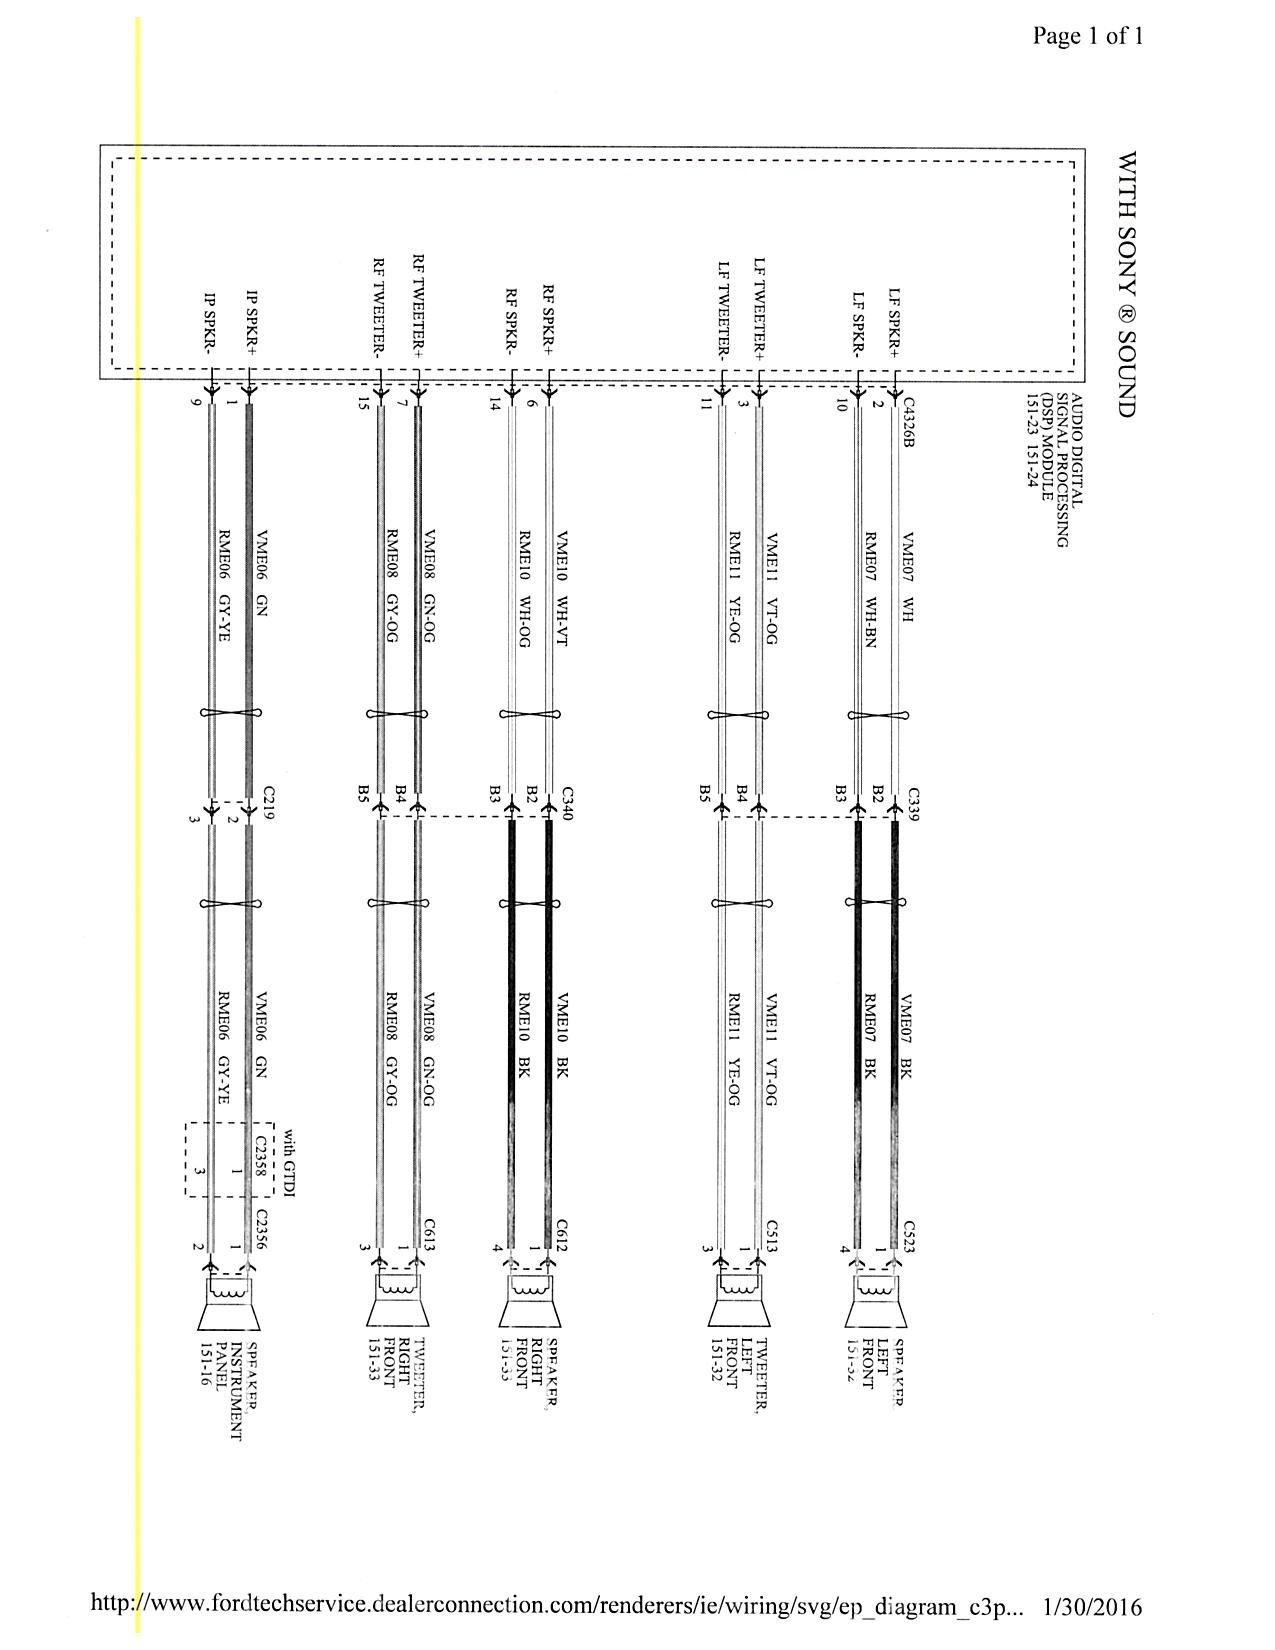 2015 Focus Mk3 5 Stereo Wiring Diagram